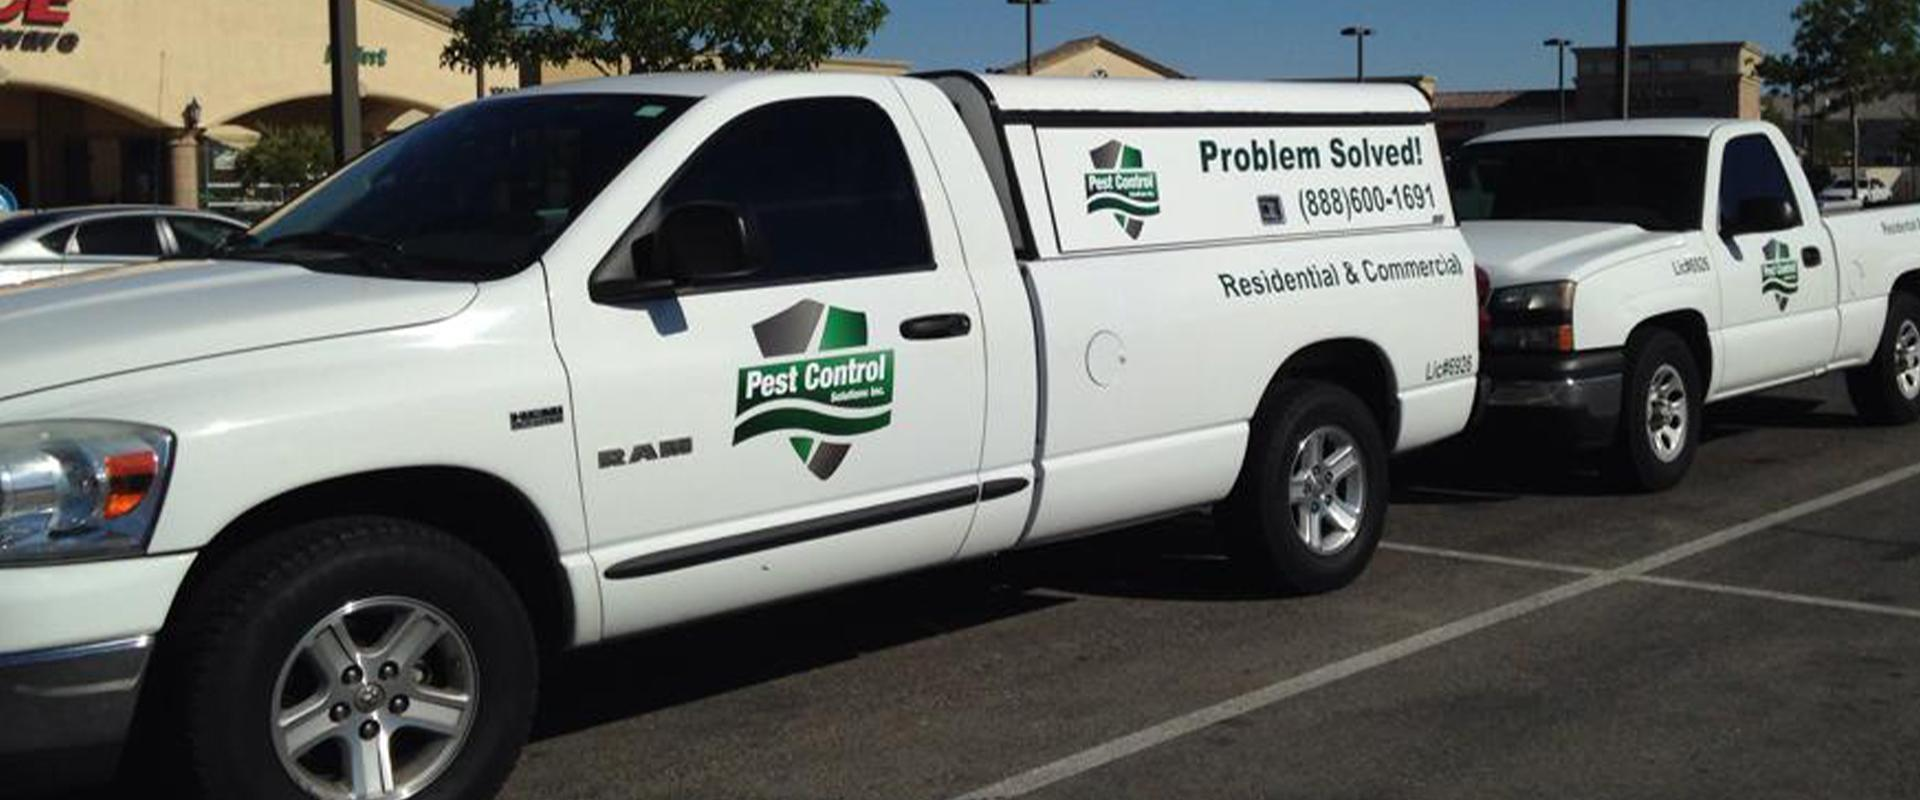 pest control solutions trucks